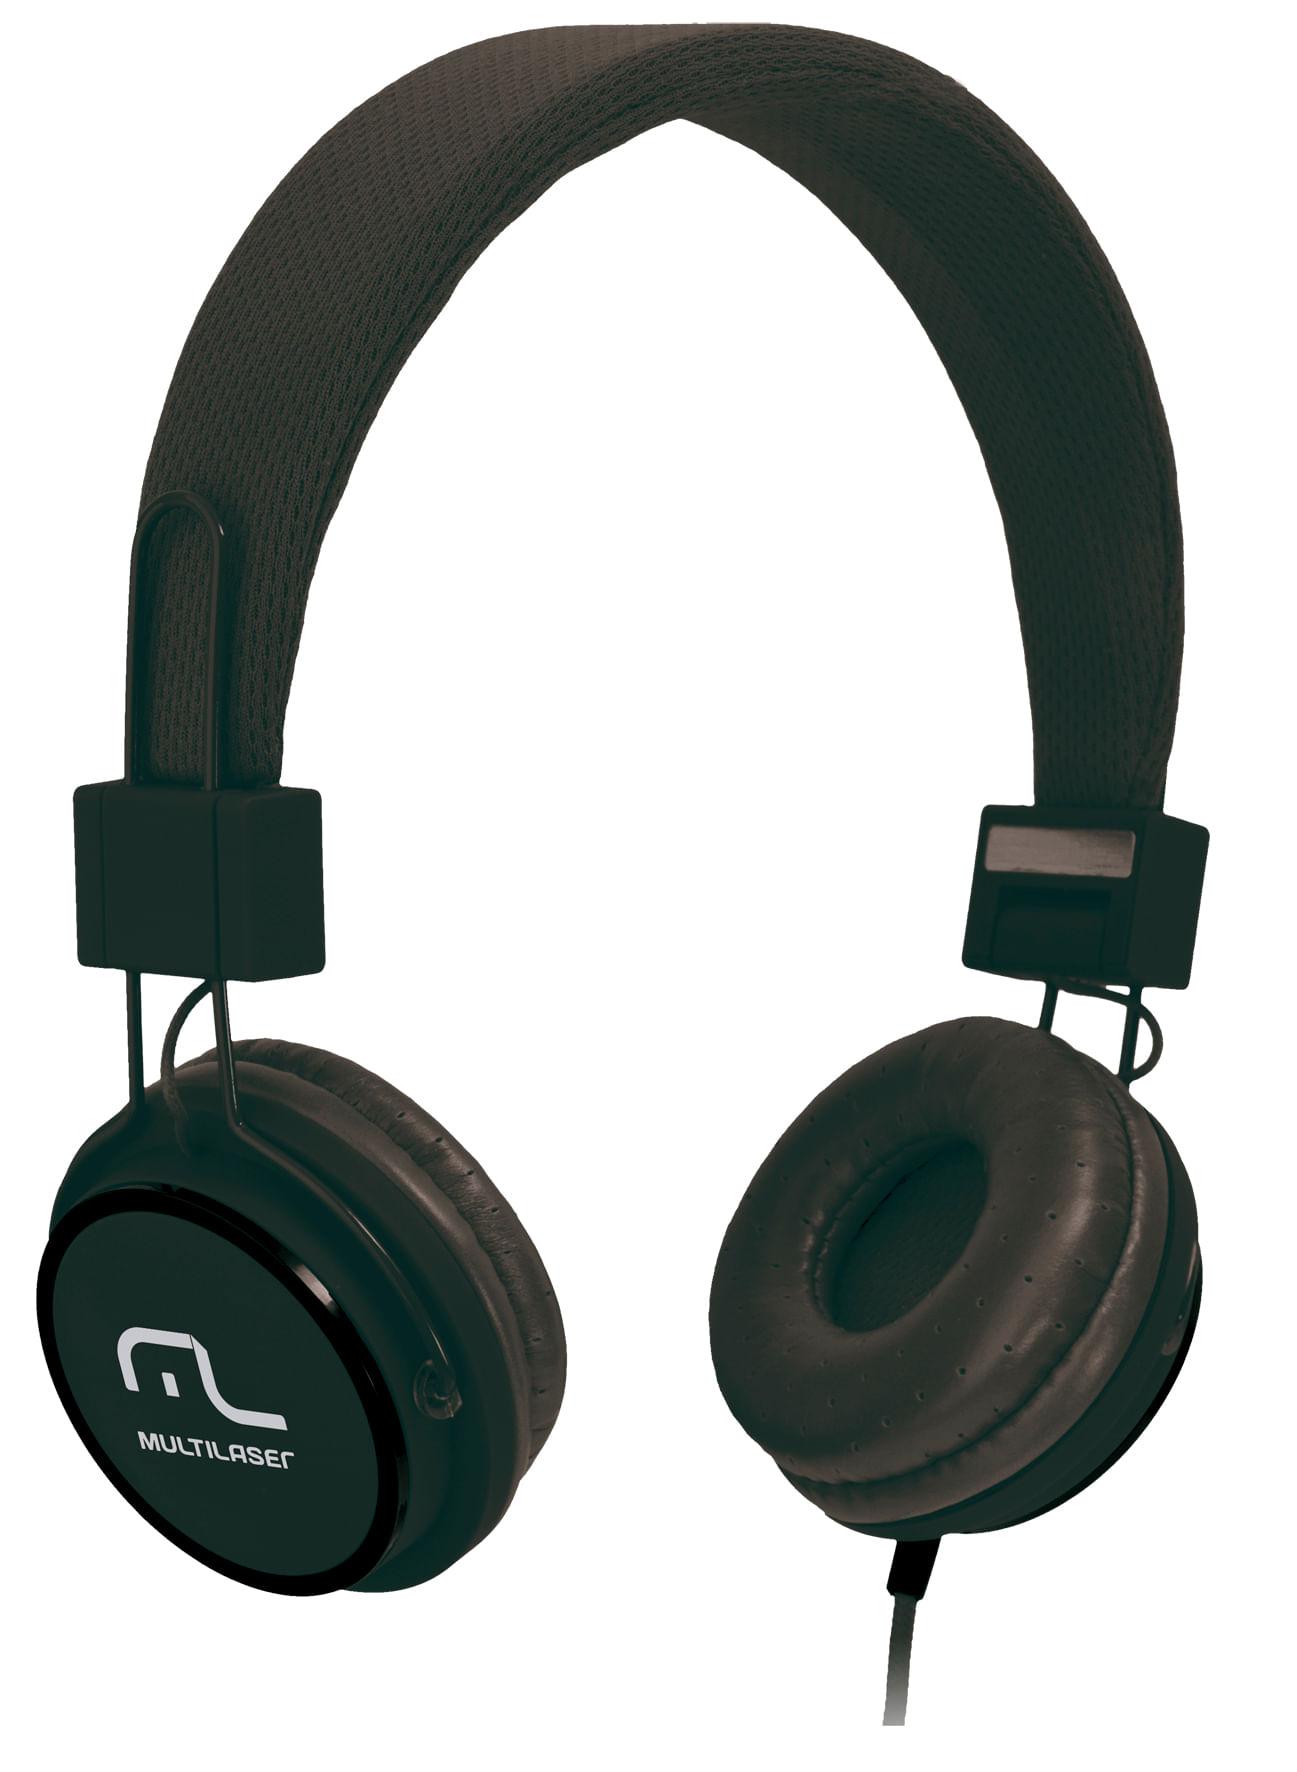 Imagem de Fone de Ouvido Multilaser com Microfone Headfun – PH115